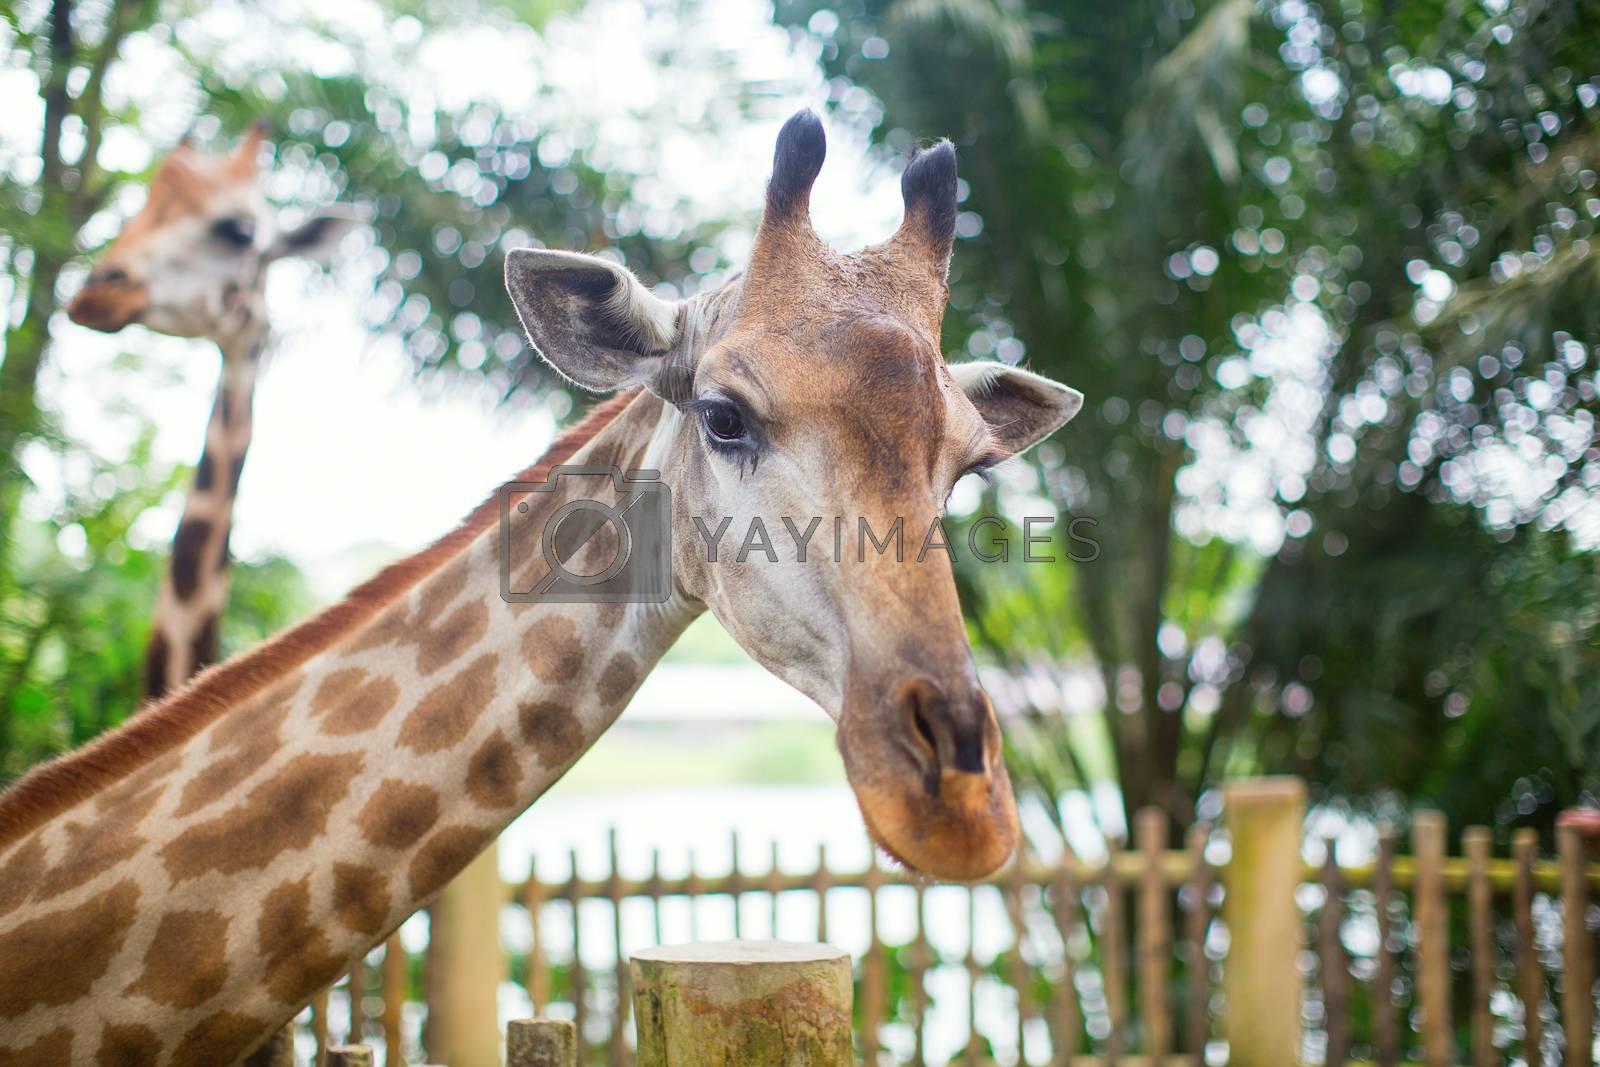 Giraffe in the zoo safari park